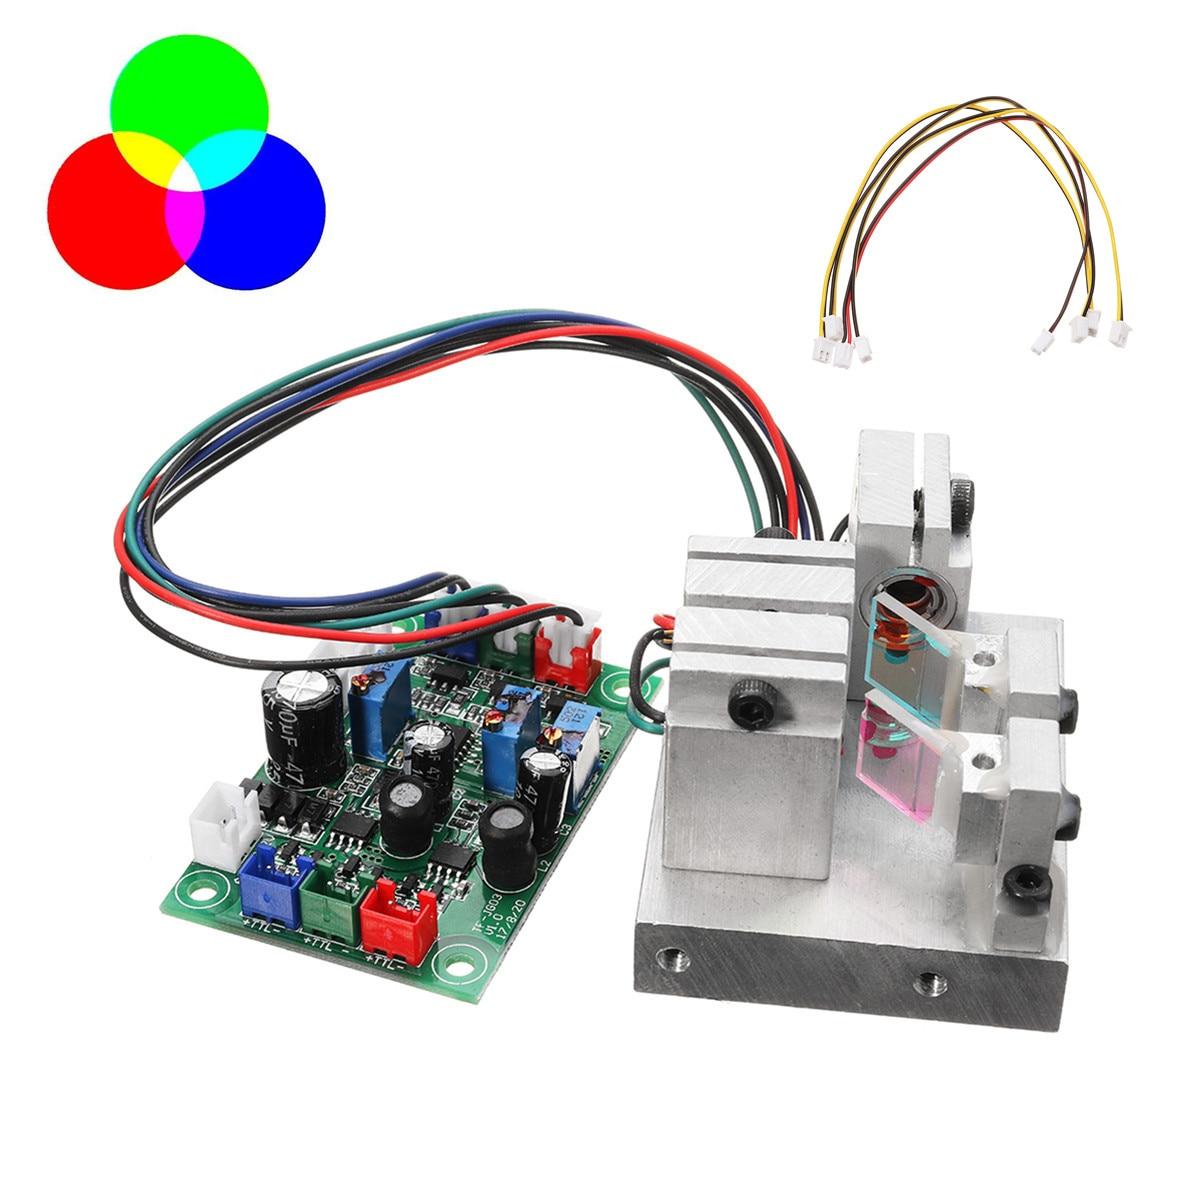 RGB 300mW Modulation Temperature Protection White Laser Module 638nm+520nm+450nm With TTL Driver Board Precision Science